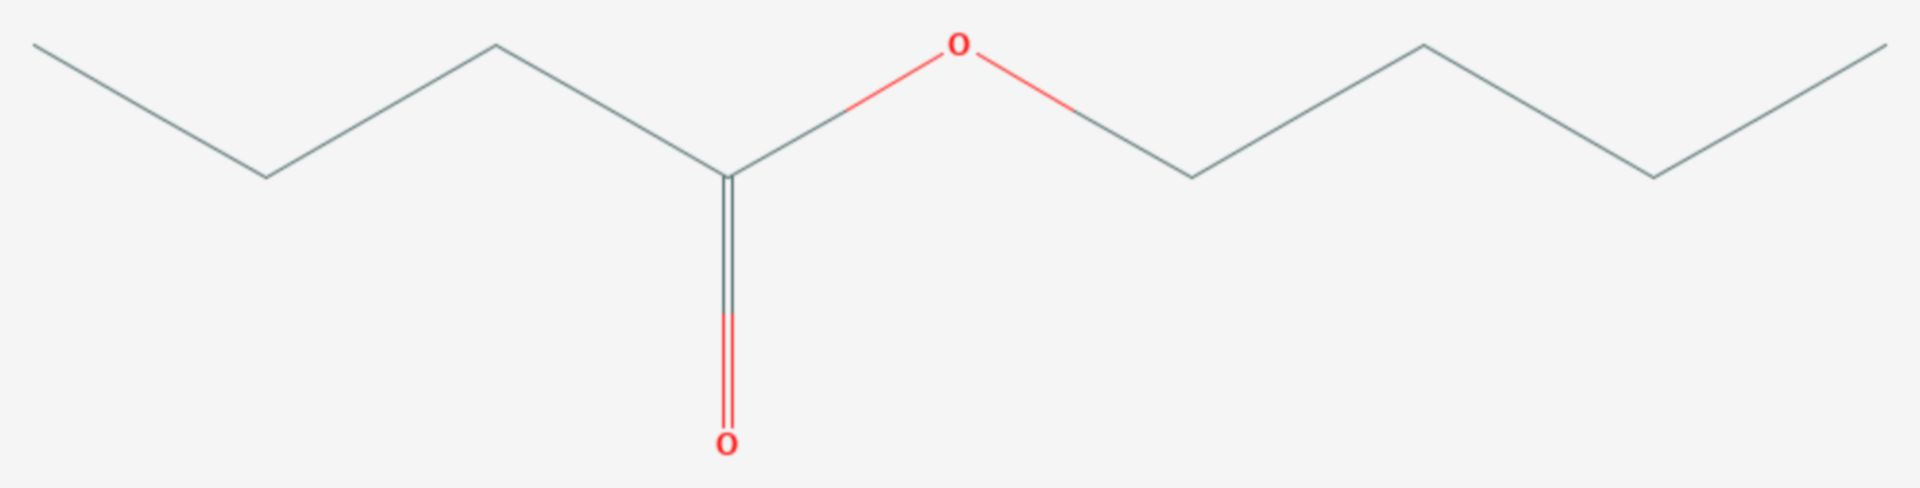 Buttersäure-n-butylester (Strukturformel)